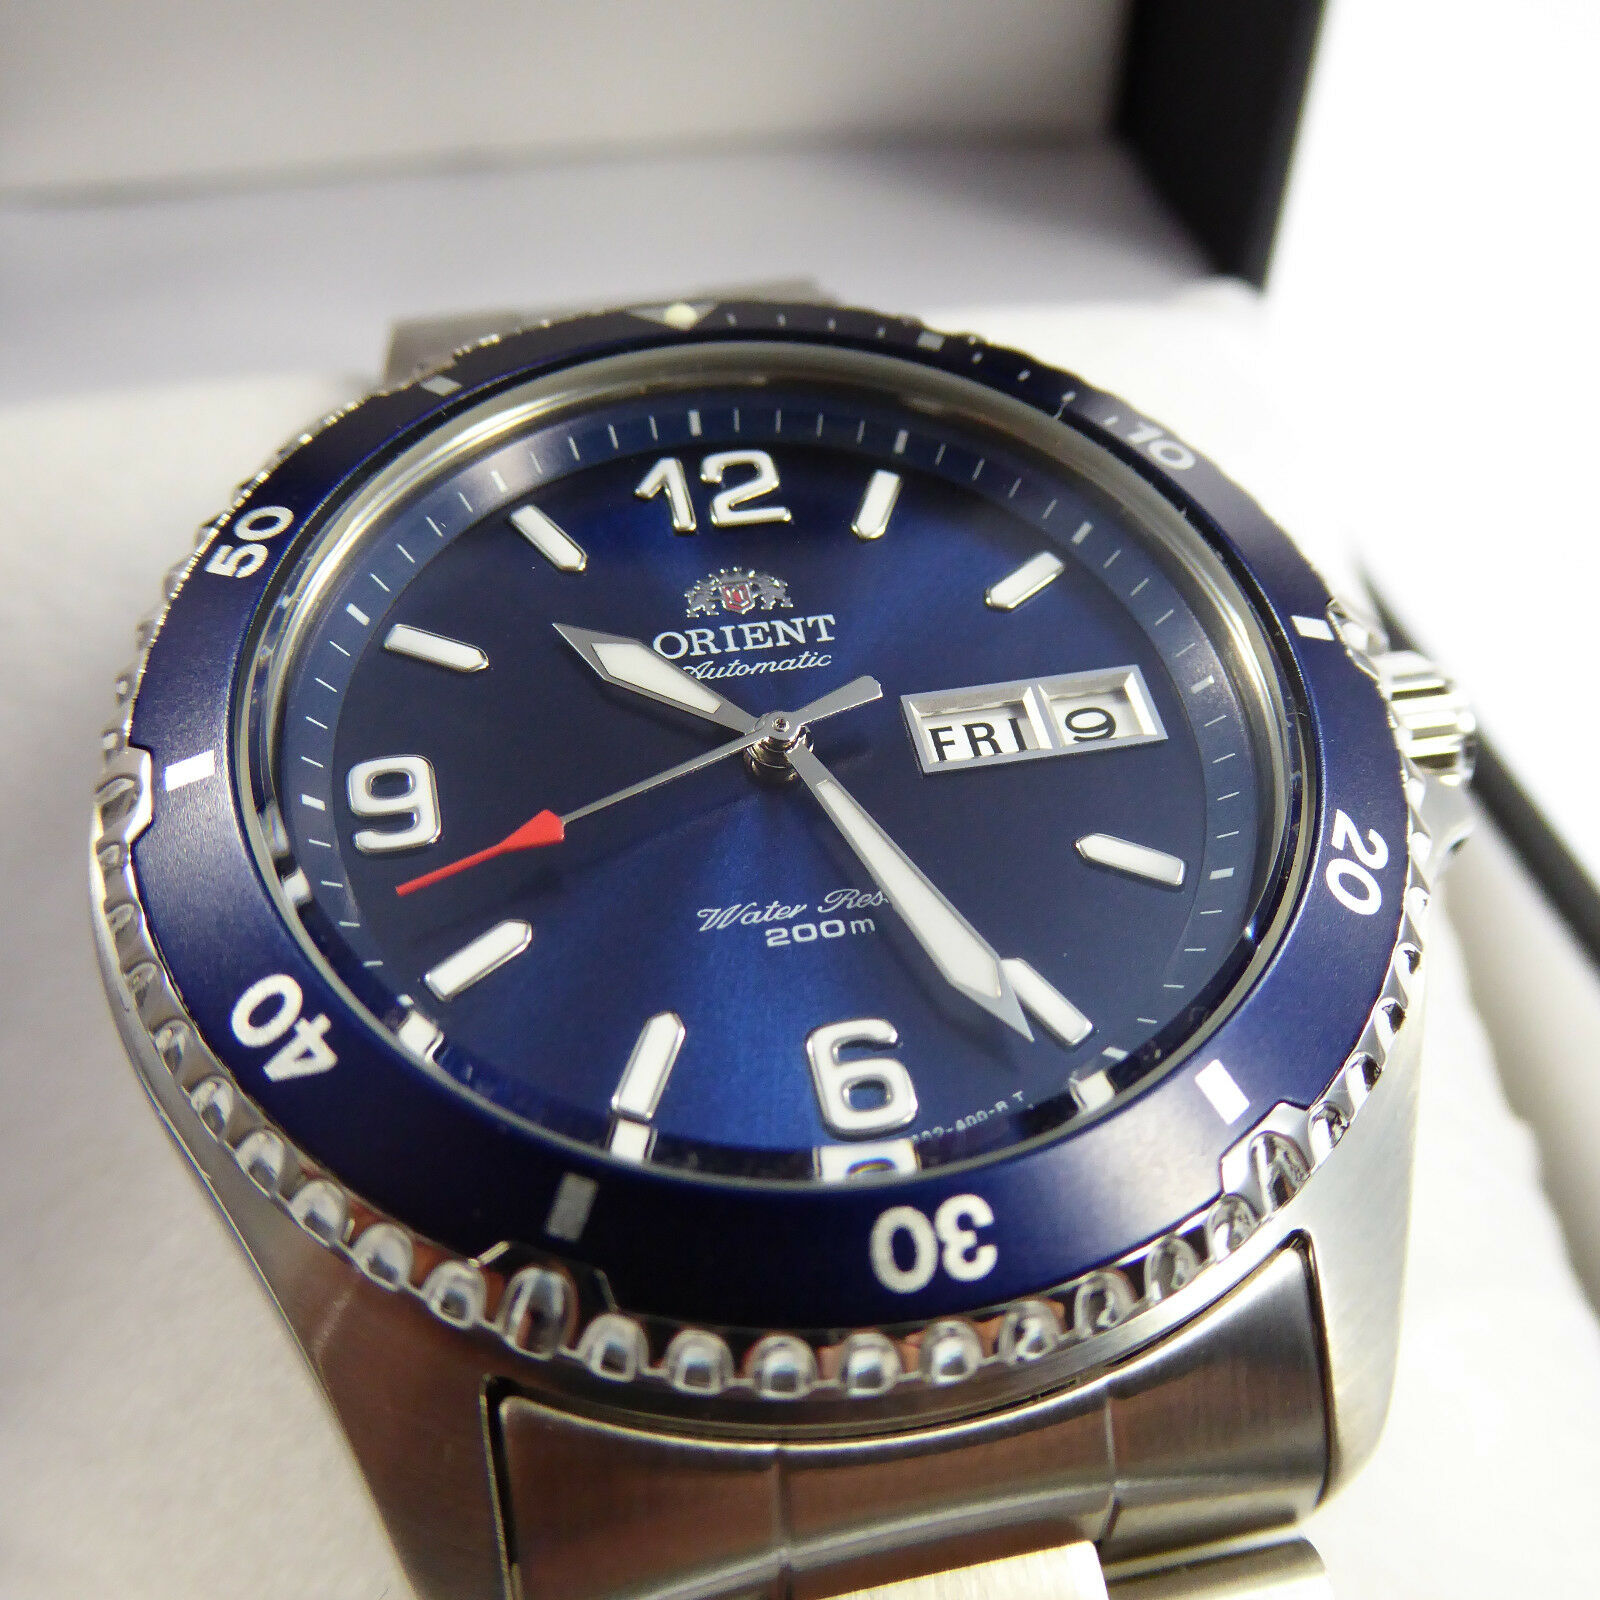 BEST PRICE! Orient Mako 2 II blau FAA02002D9 Watch Automatik Herren Taucher Uhr